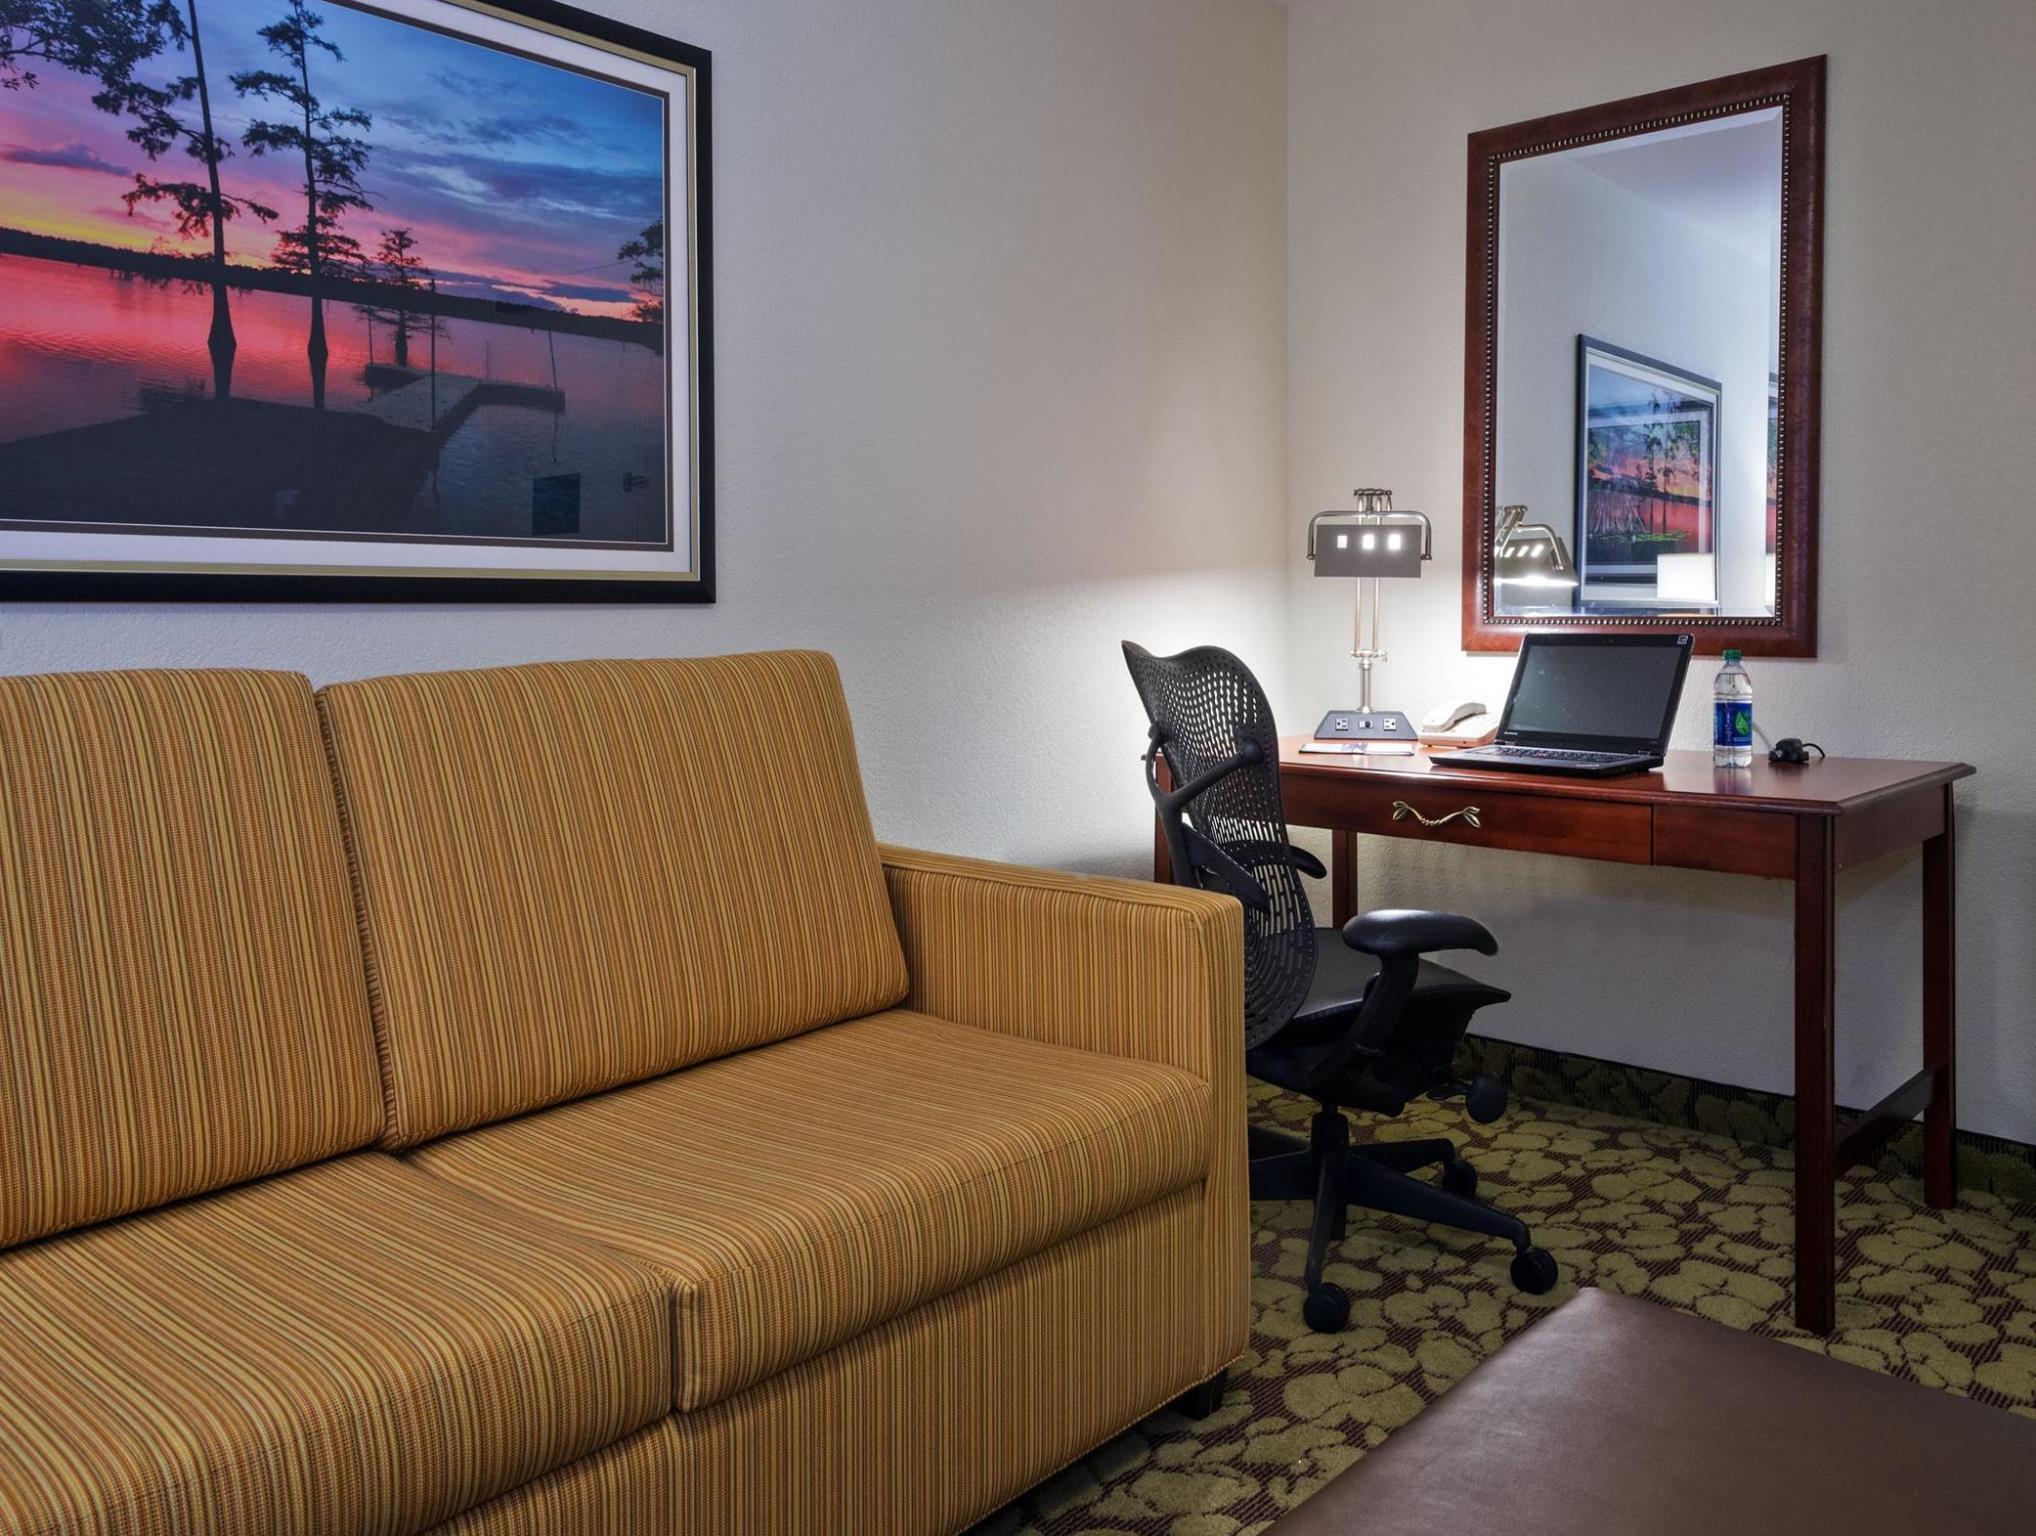 Best Price on Hilton Garden Inn LaFayette Cajundome in Lafayette LA